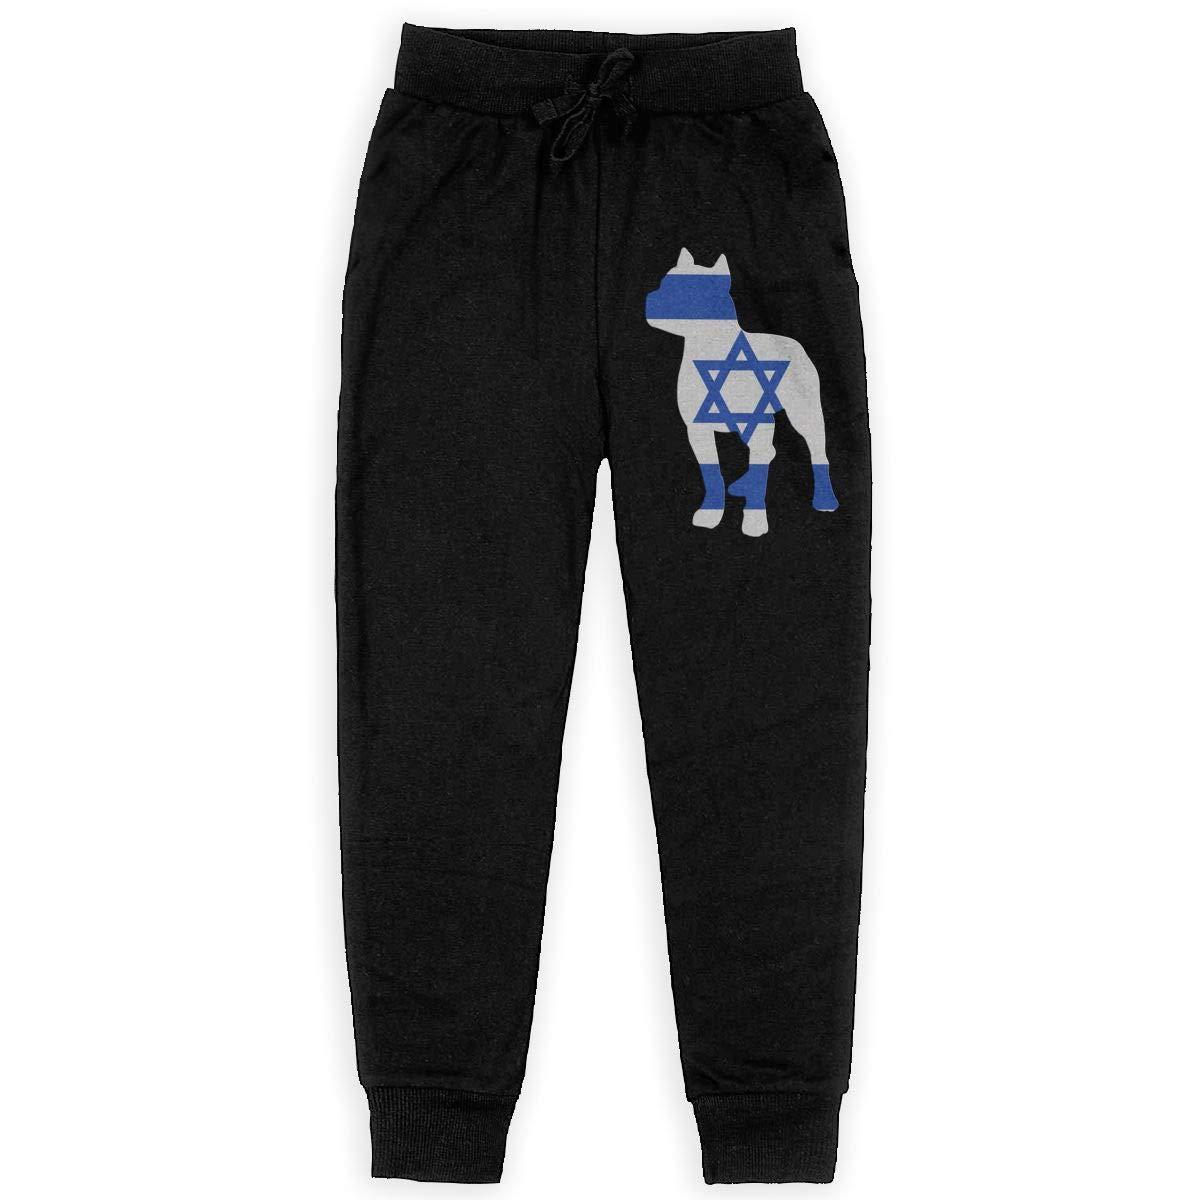 Teenager Active Pants for Teenager Girls WYZVK22 Patriotic Pitbull Israel Flag Soft//Cozy Sweatpants